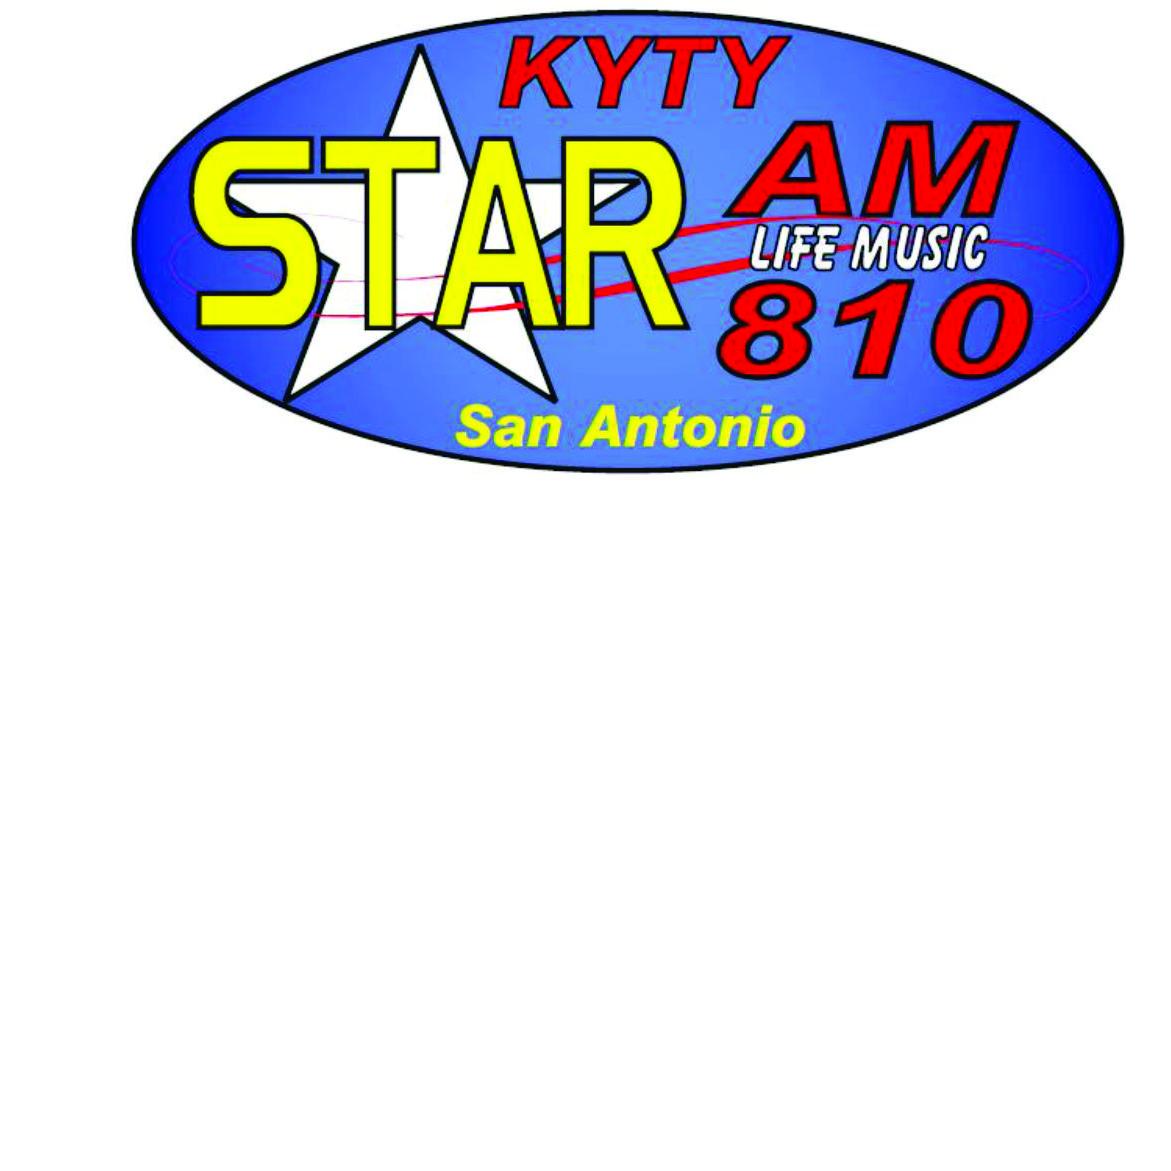 Star Radio 810